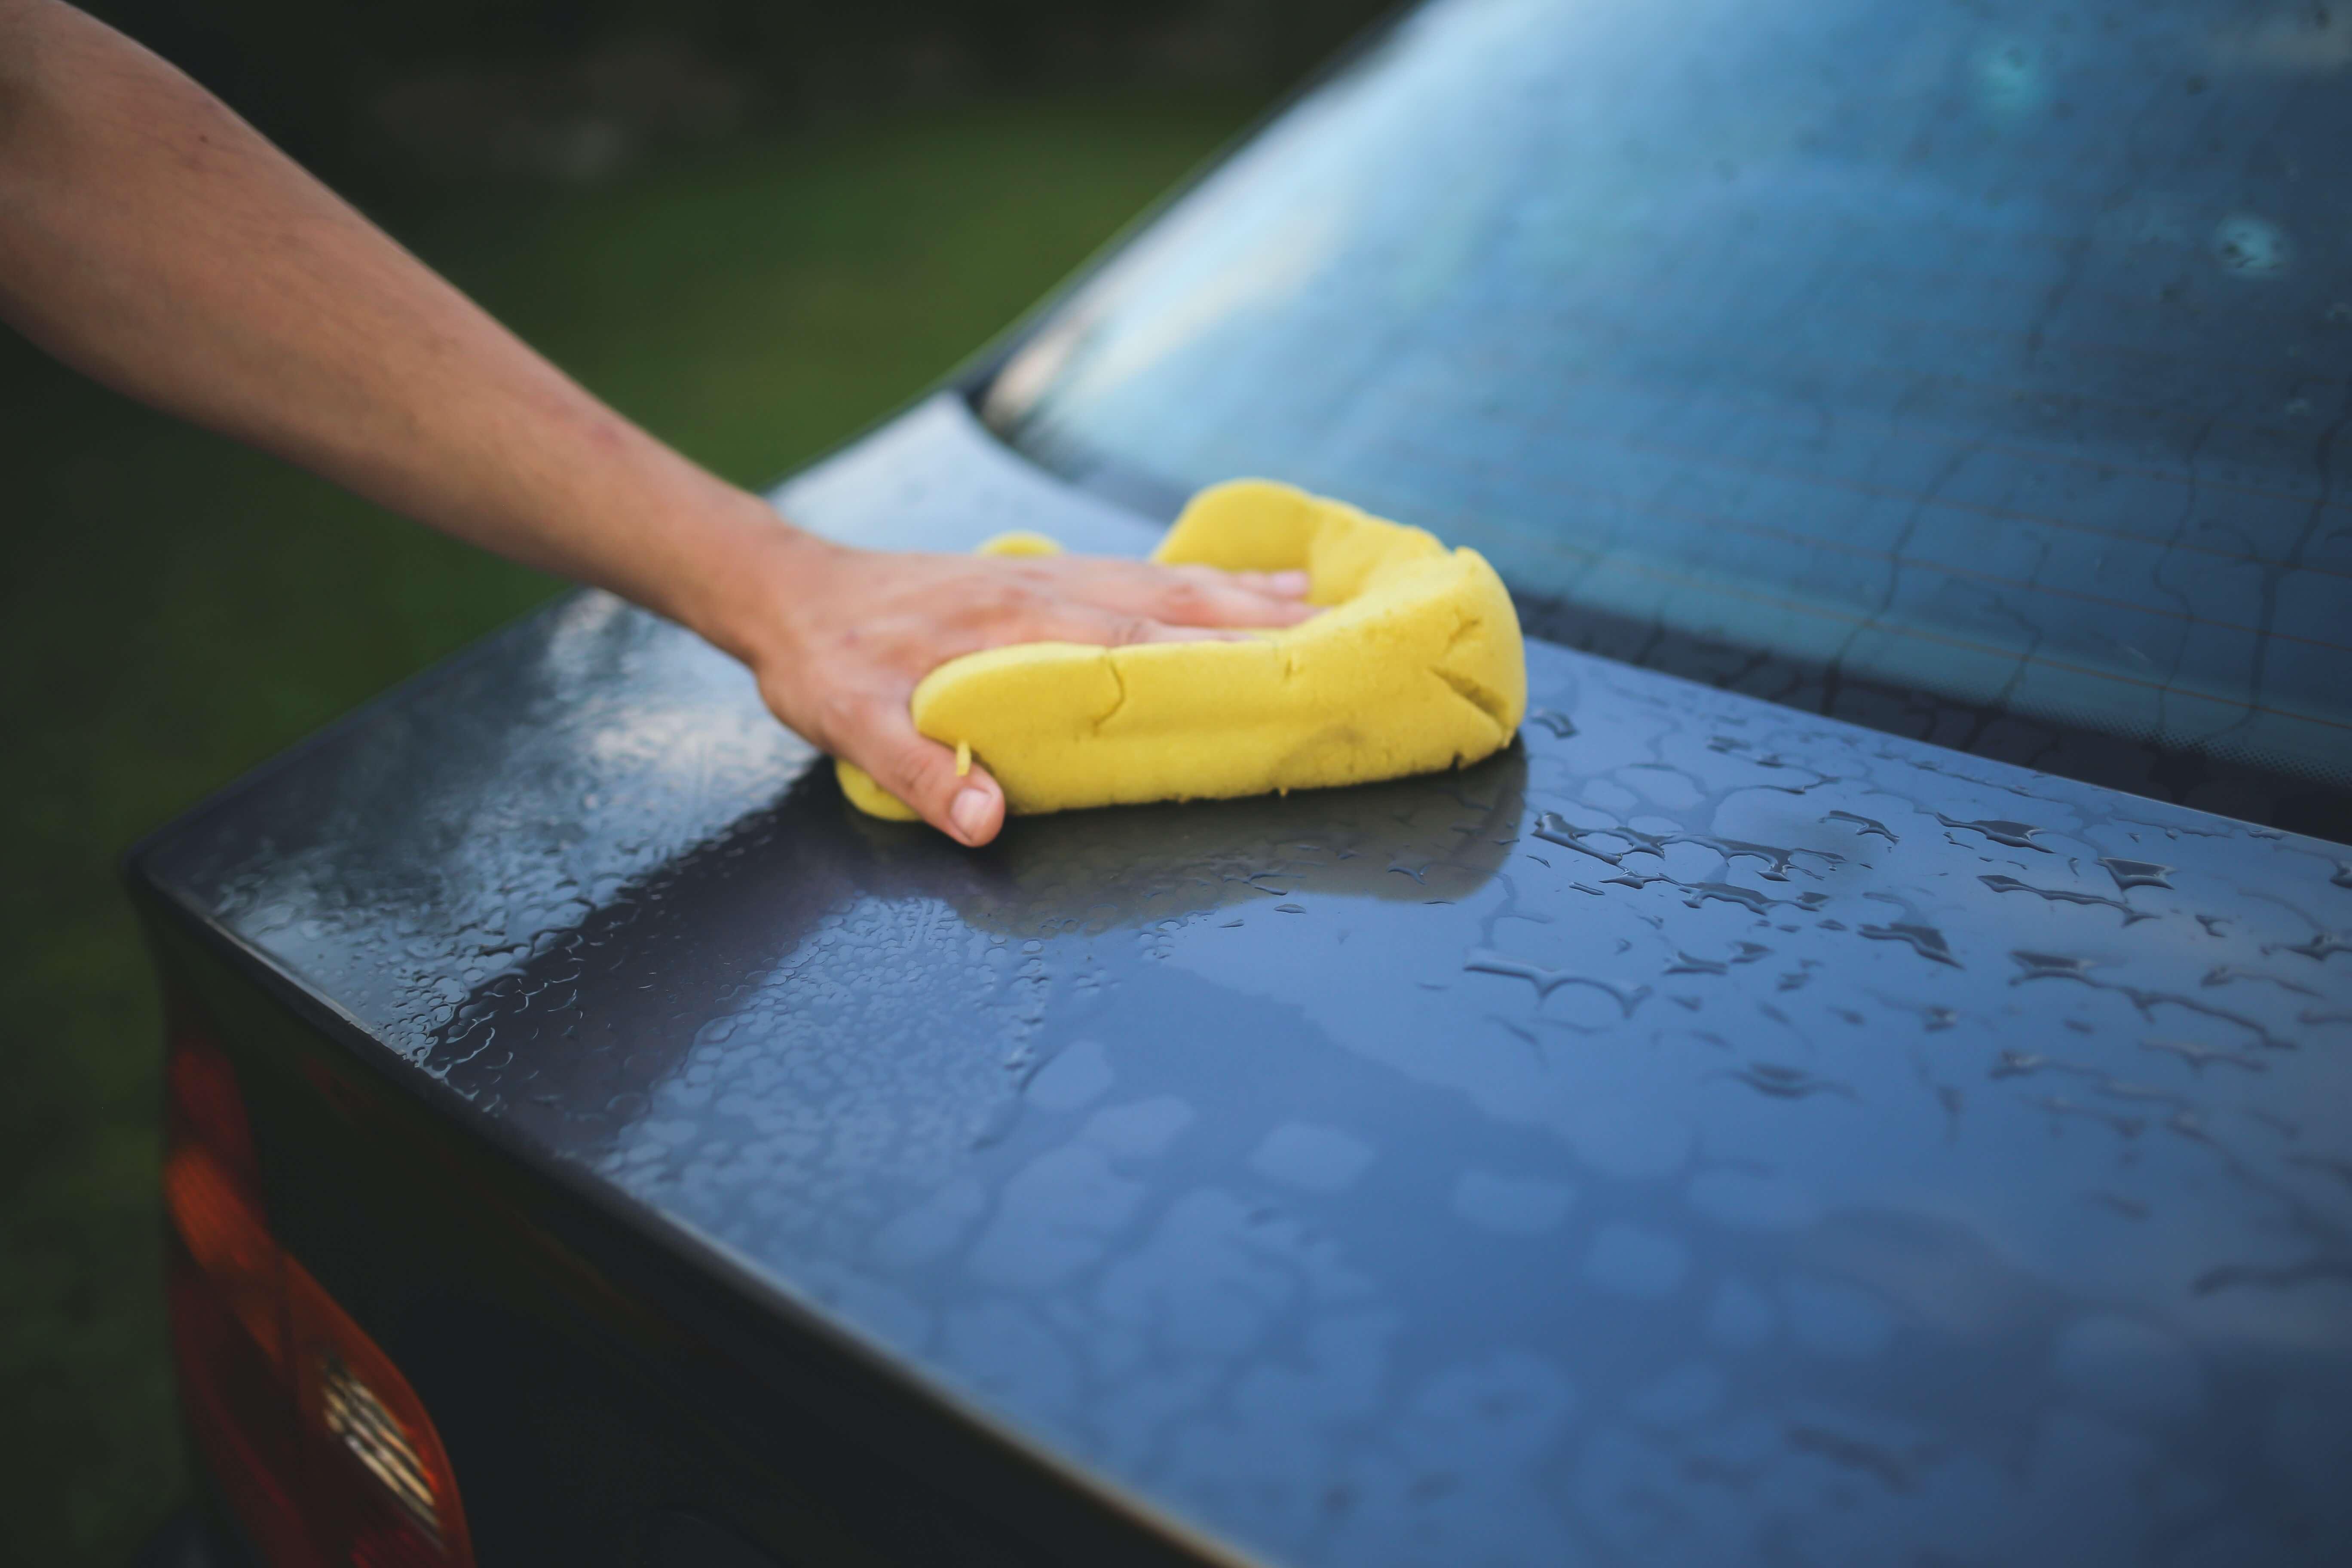 washing-a-car-with-a-sponge